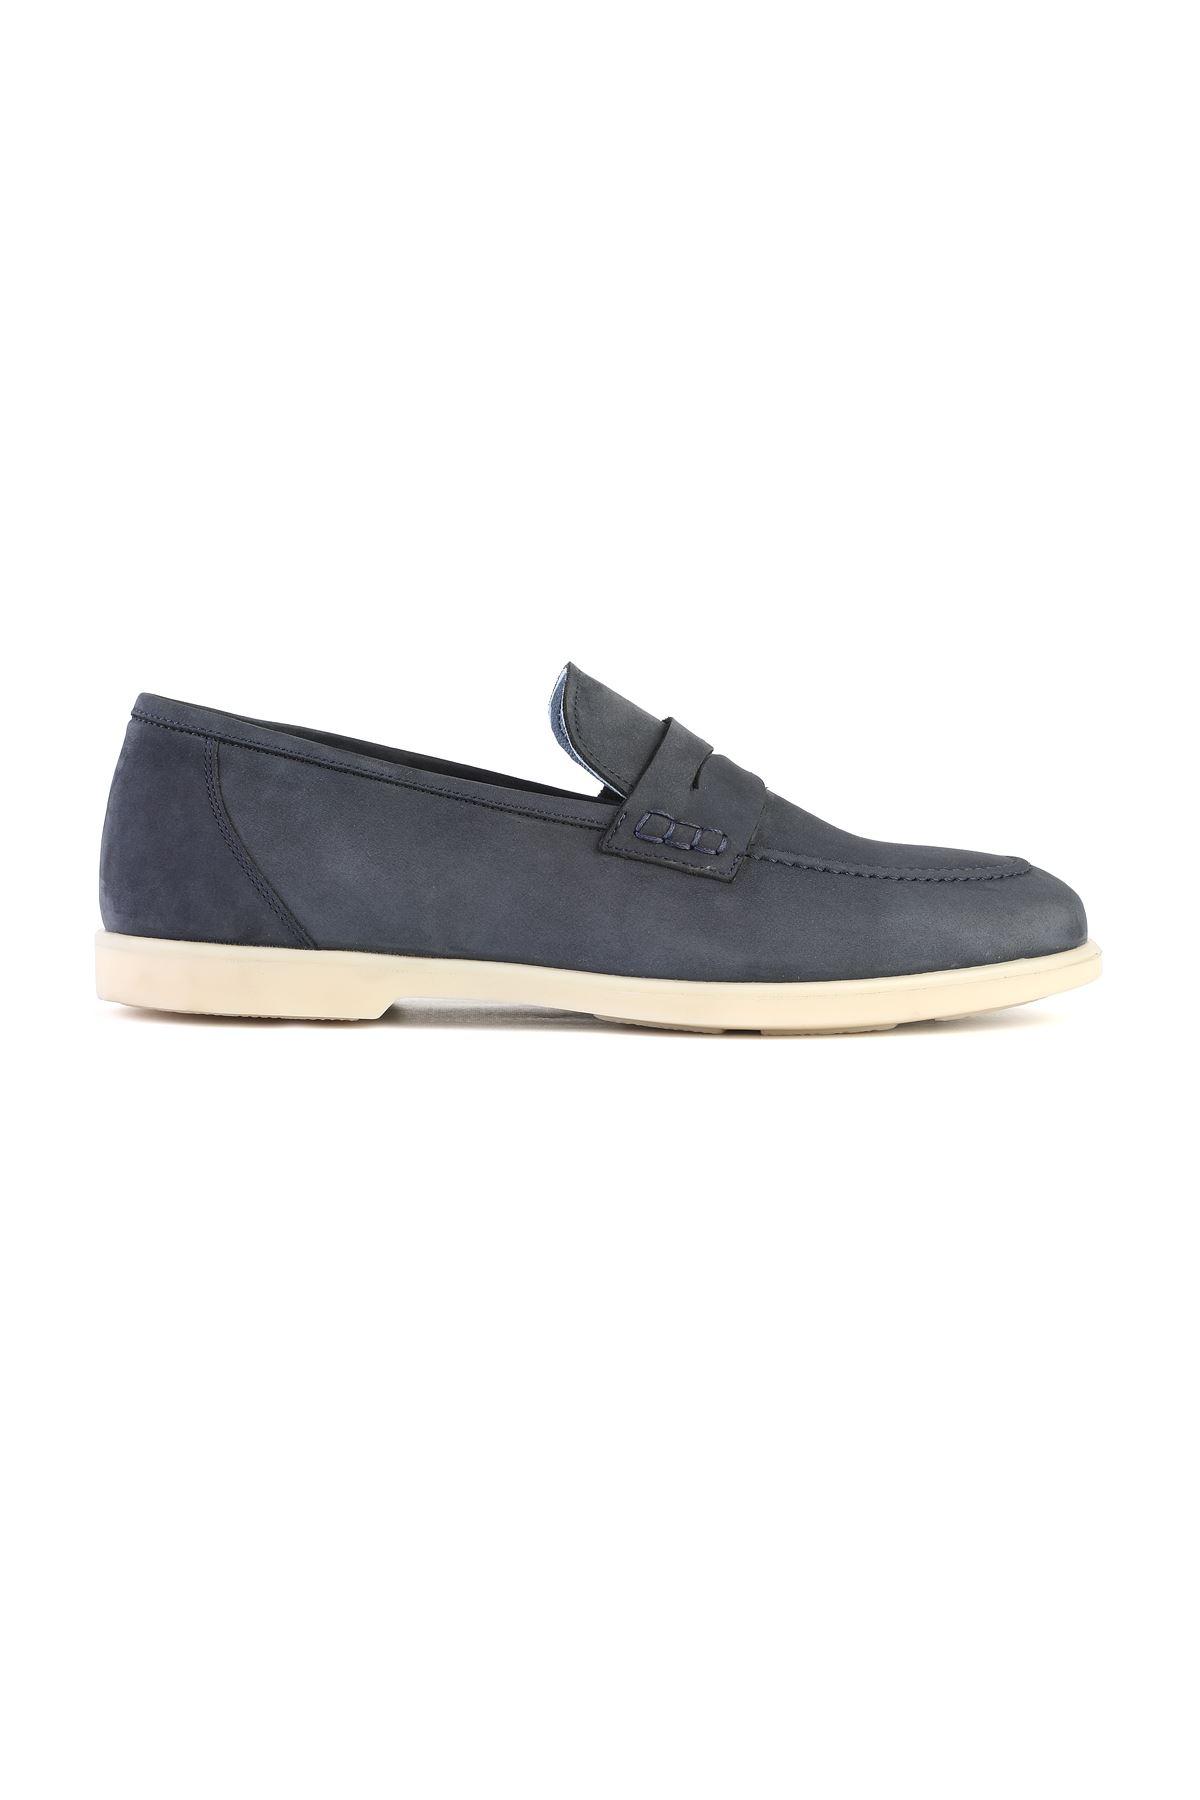 Libero 3216 Lacivert Loafer Ayakkabı